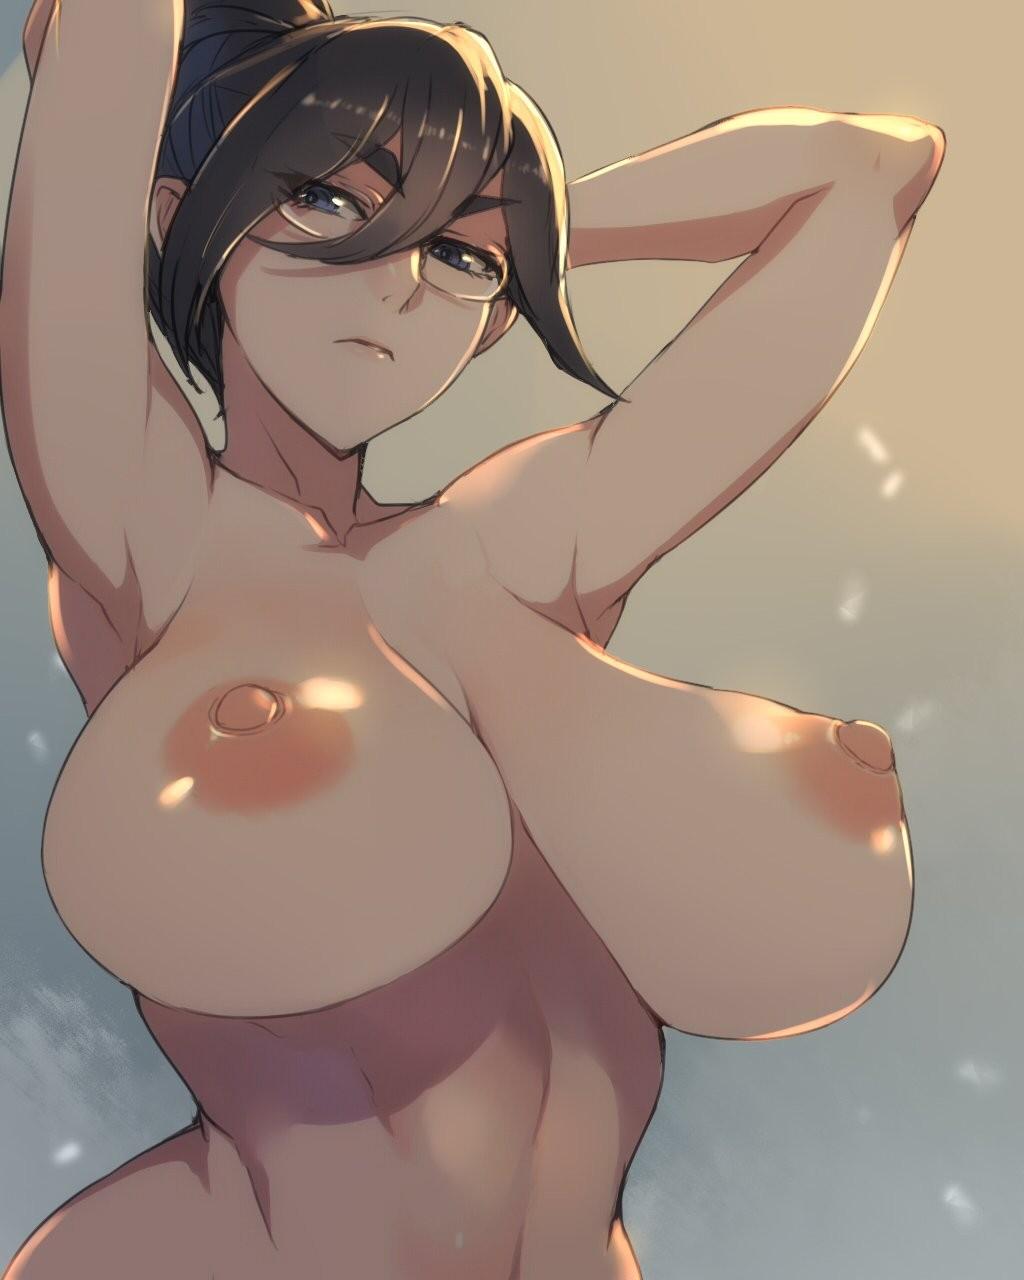 woman Hentai porn big